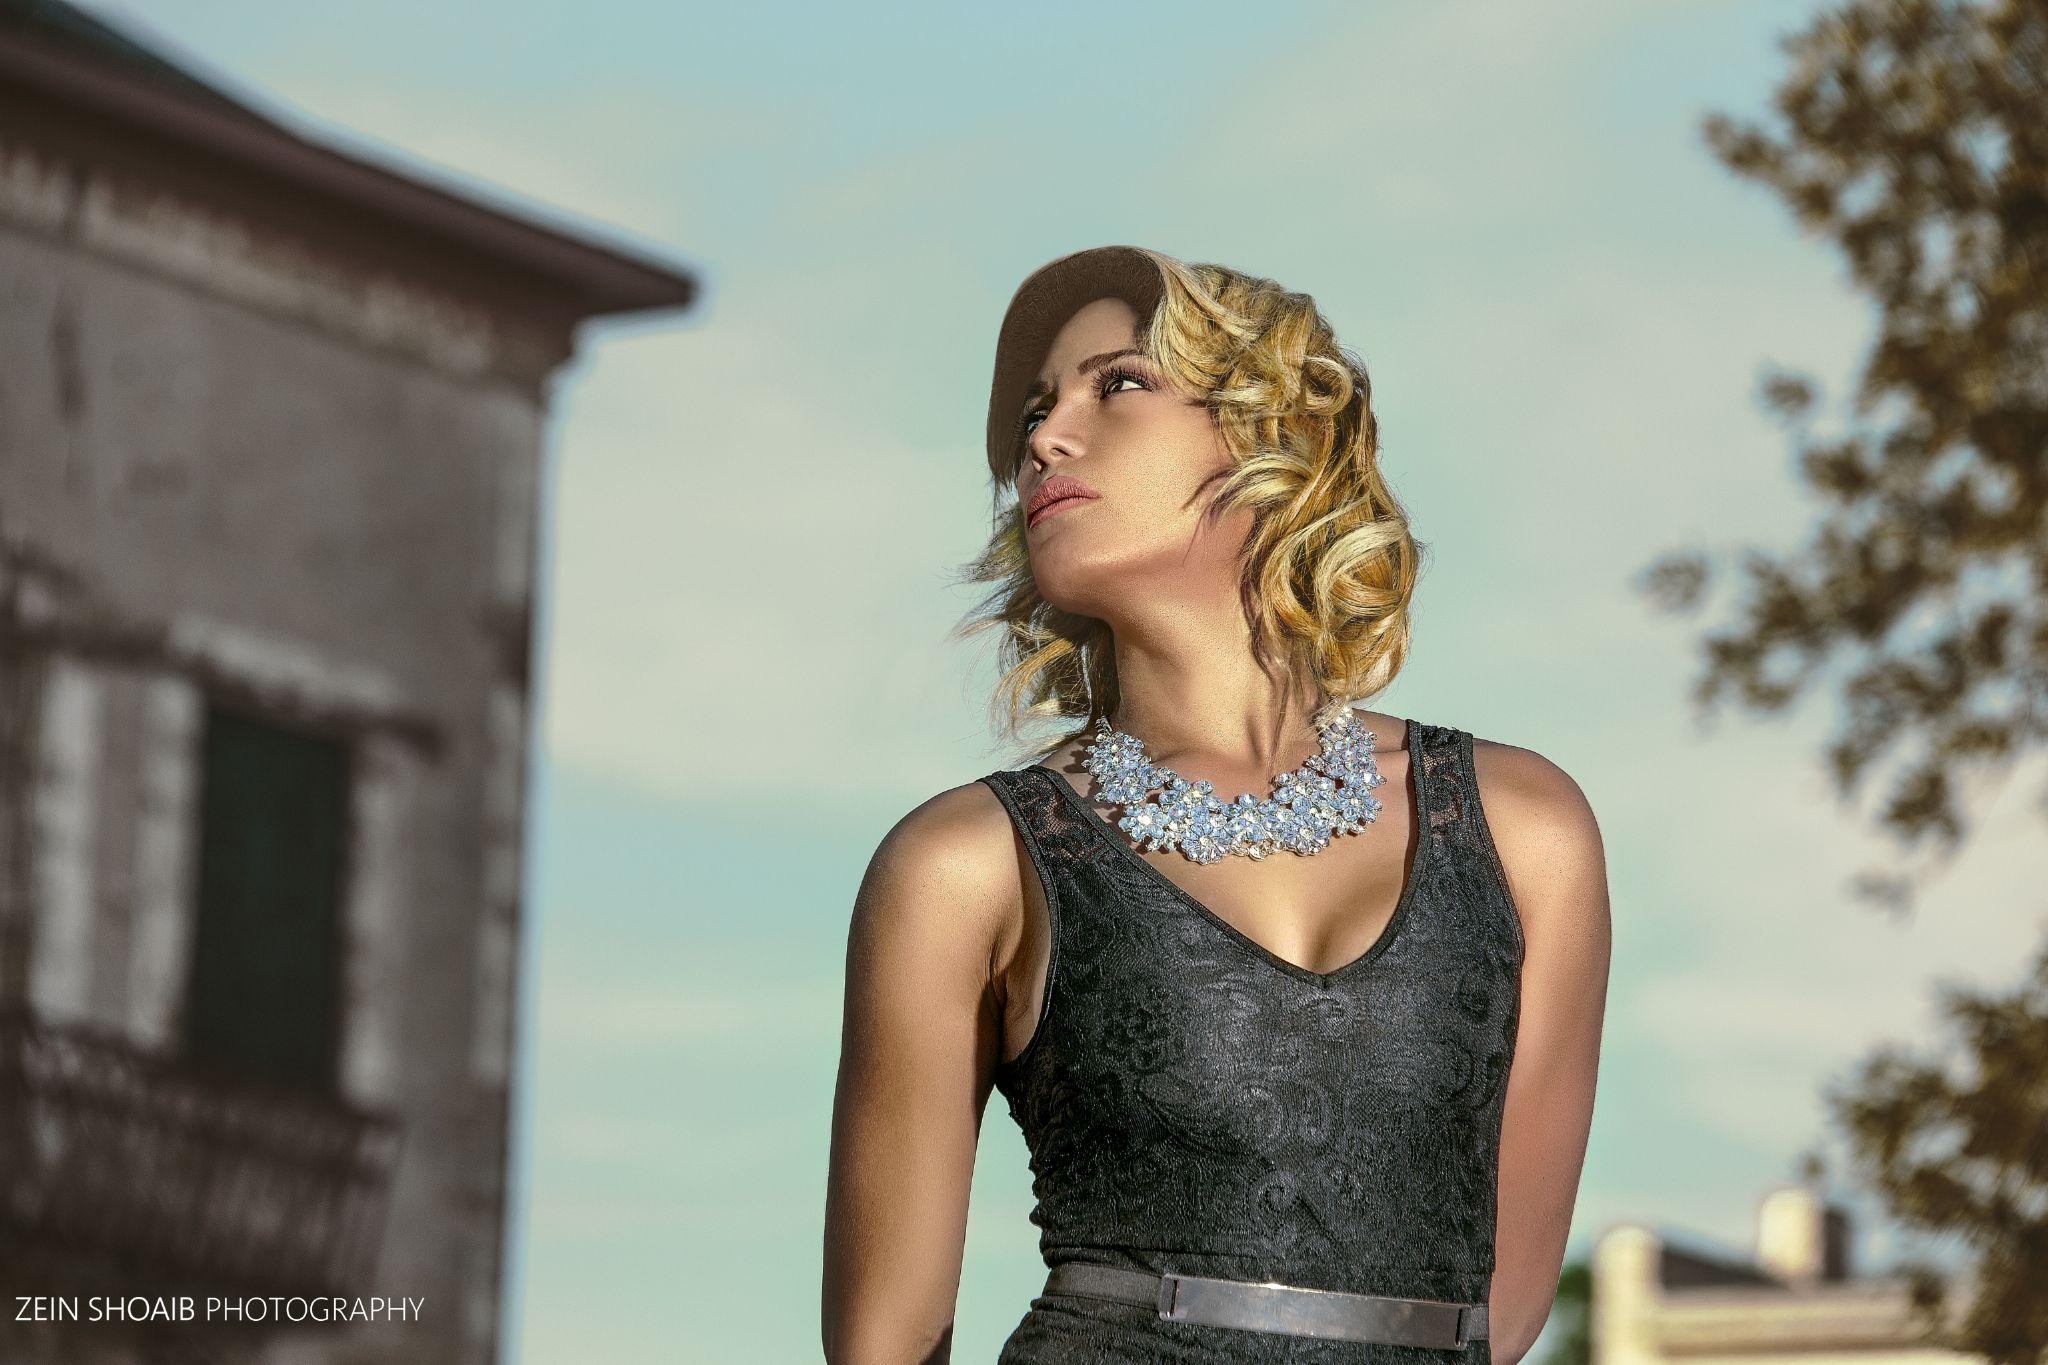 Zein Shoaib Photography by Zein Shoaib